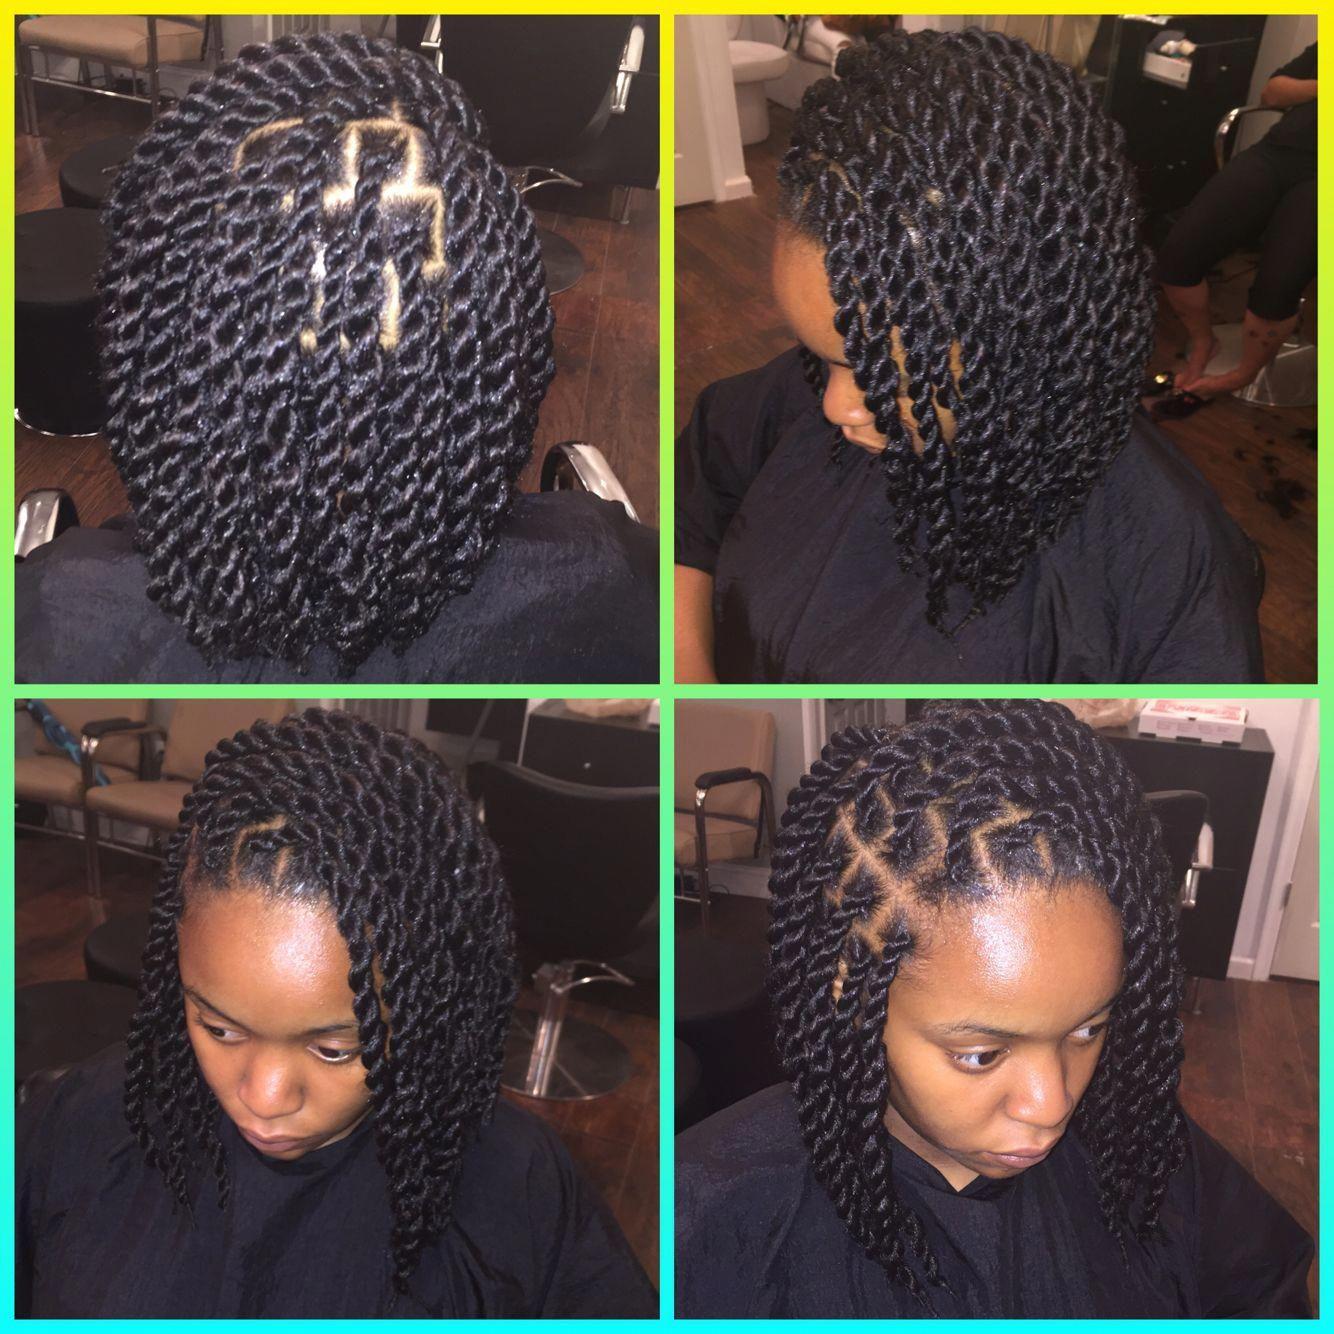 Show Me Black Hairstyles Hair Designs For Black Women Long Pixie Hairstyles 20190501 Natural Hair Styles Natural Hair Twists Natural Hair Twist Out